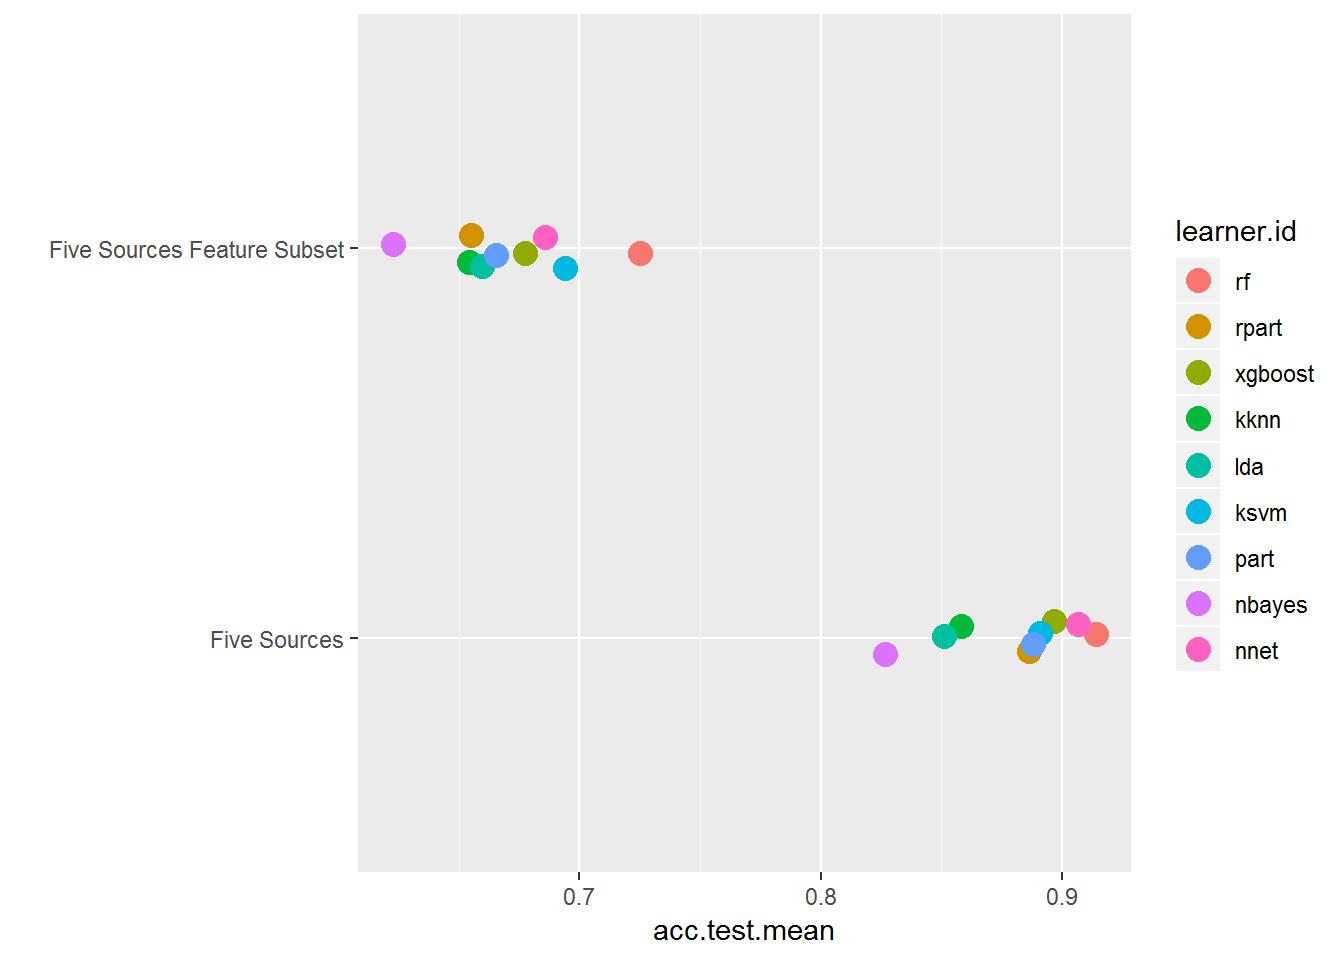 Predictive Analytics using Machine Learning (article) - DataCamp